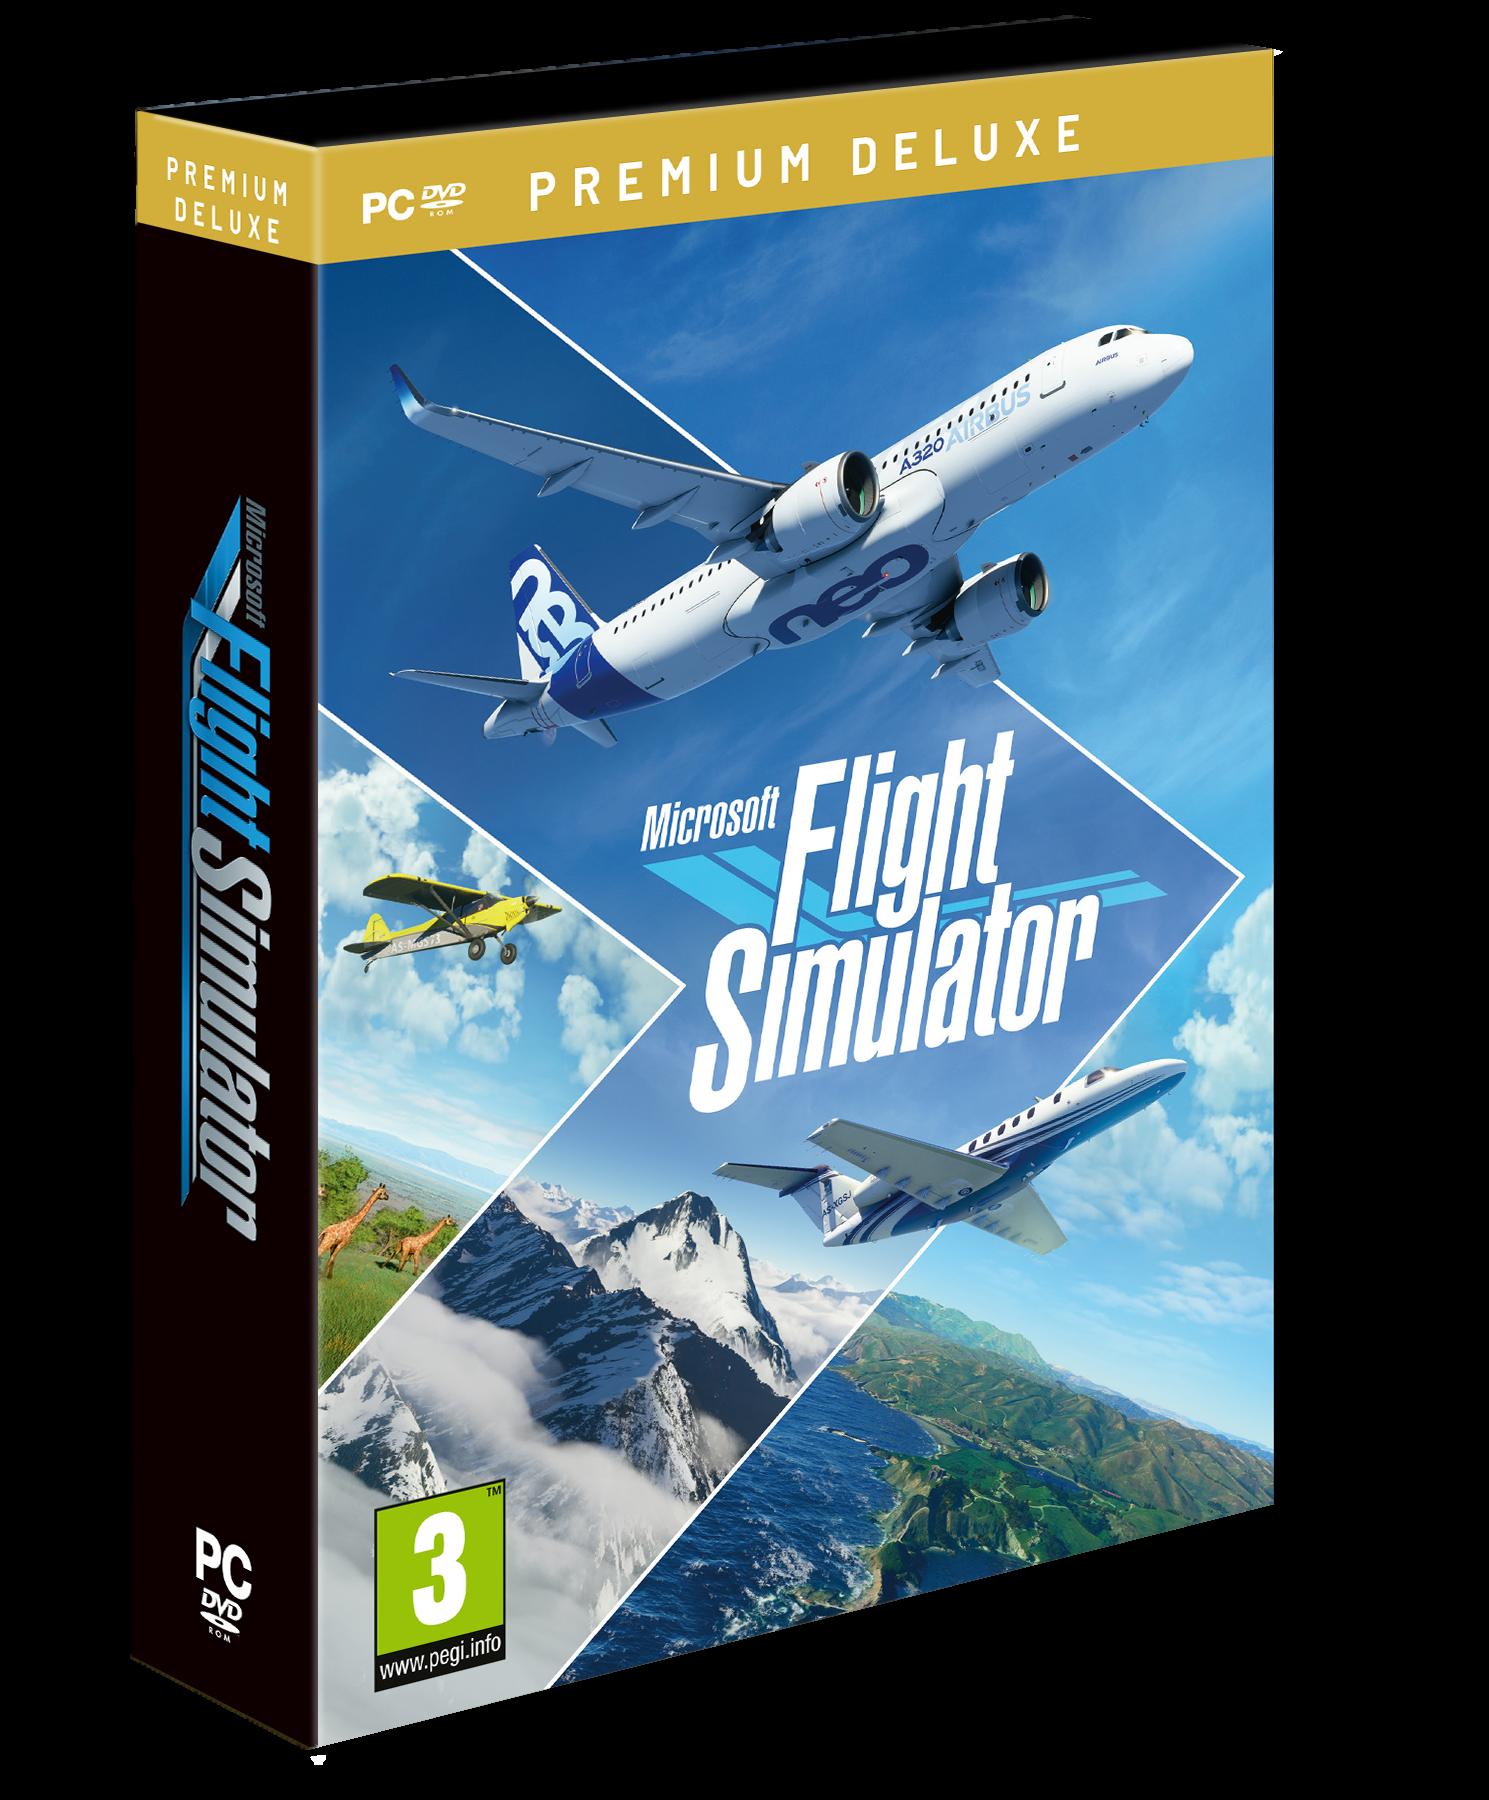 Microsoft Flight Sim 2020 (Premium Deluxe Edition) (DVD Format)